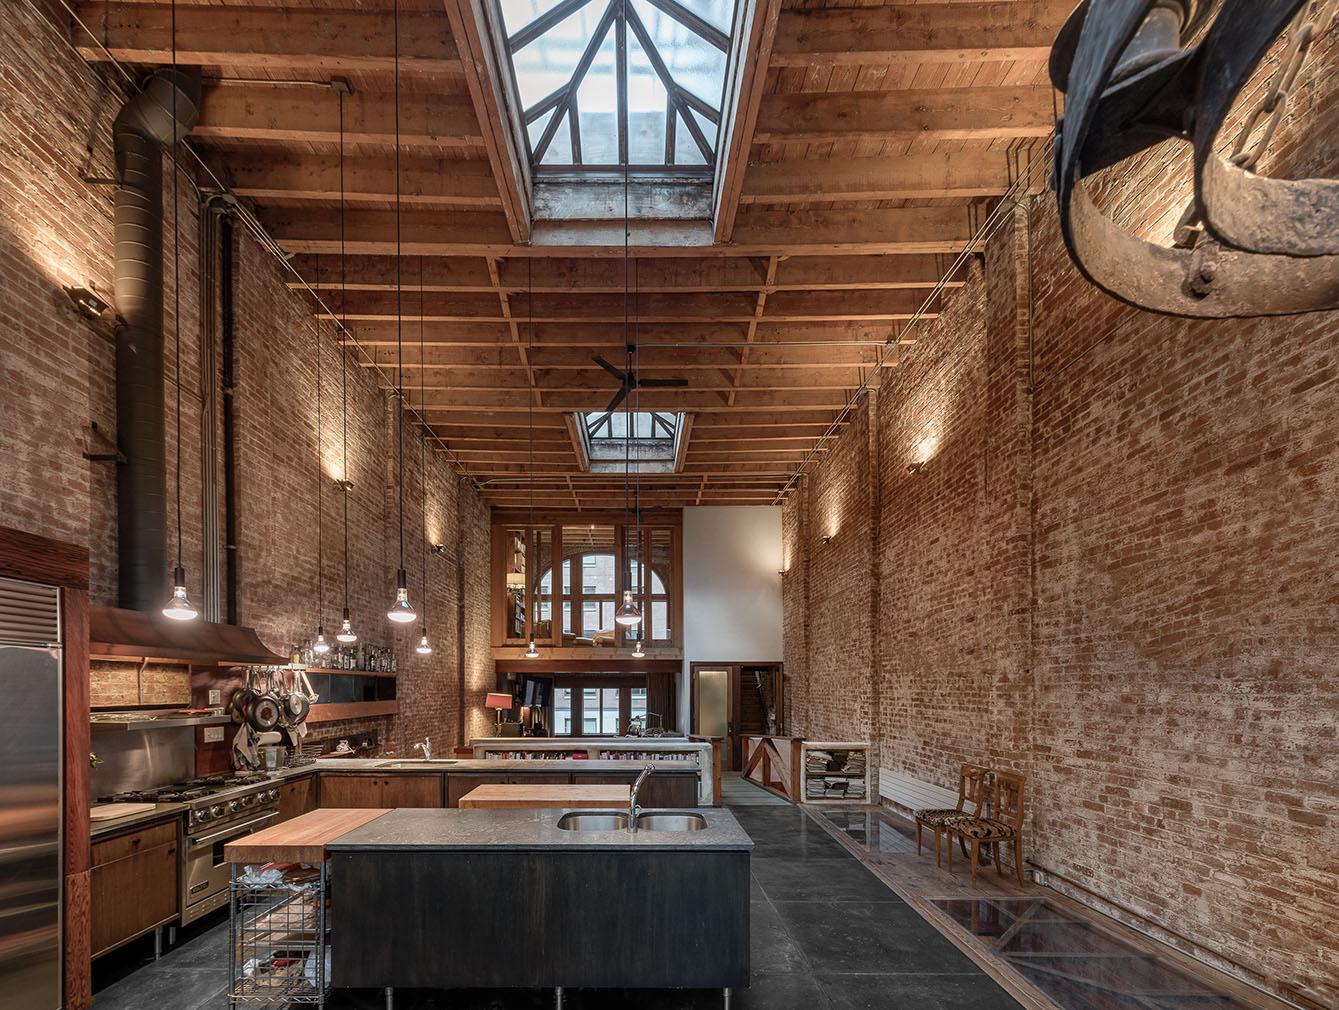 A set designer's warehouse studio is for sale in Manhattan